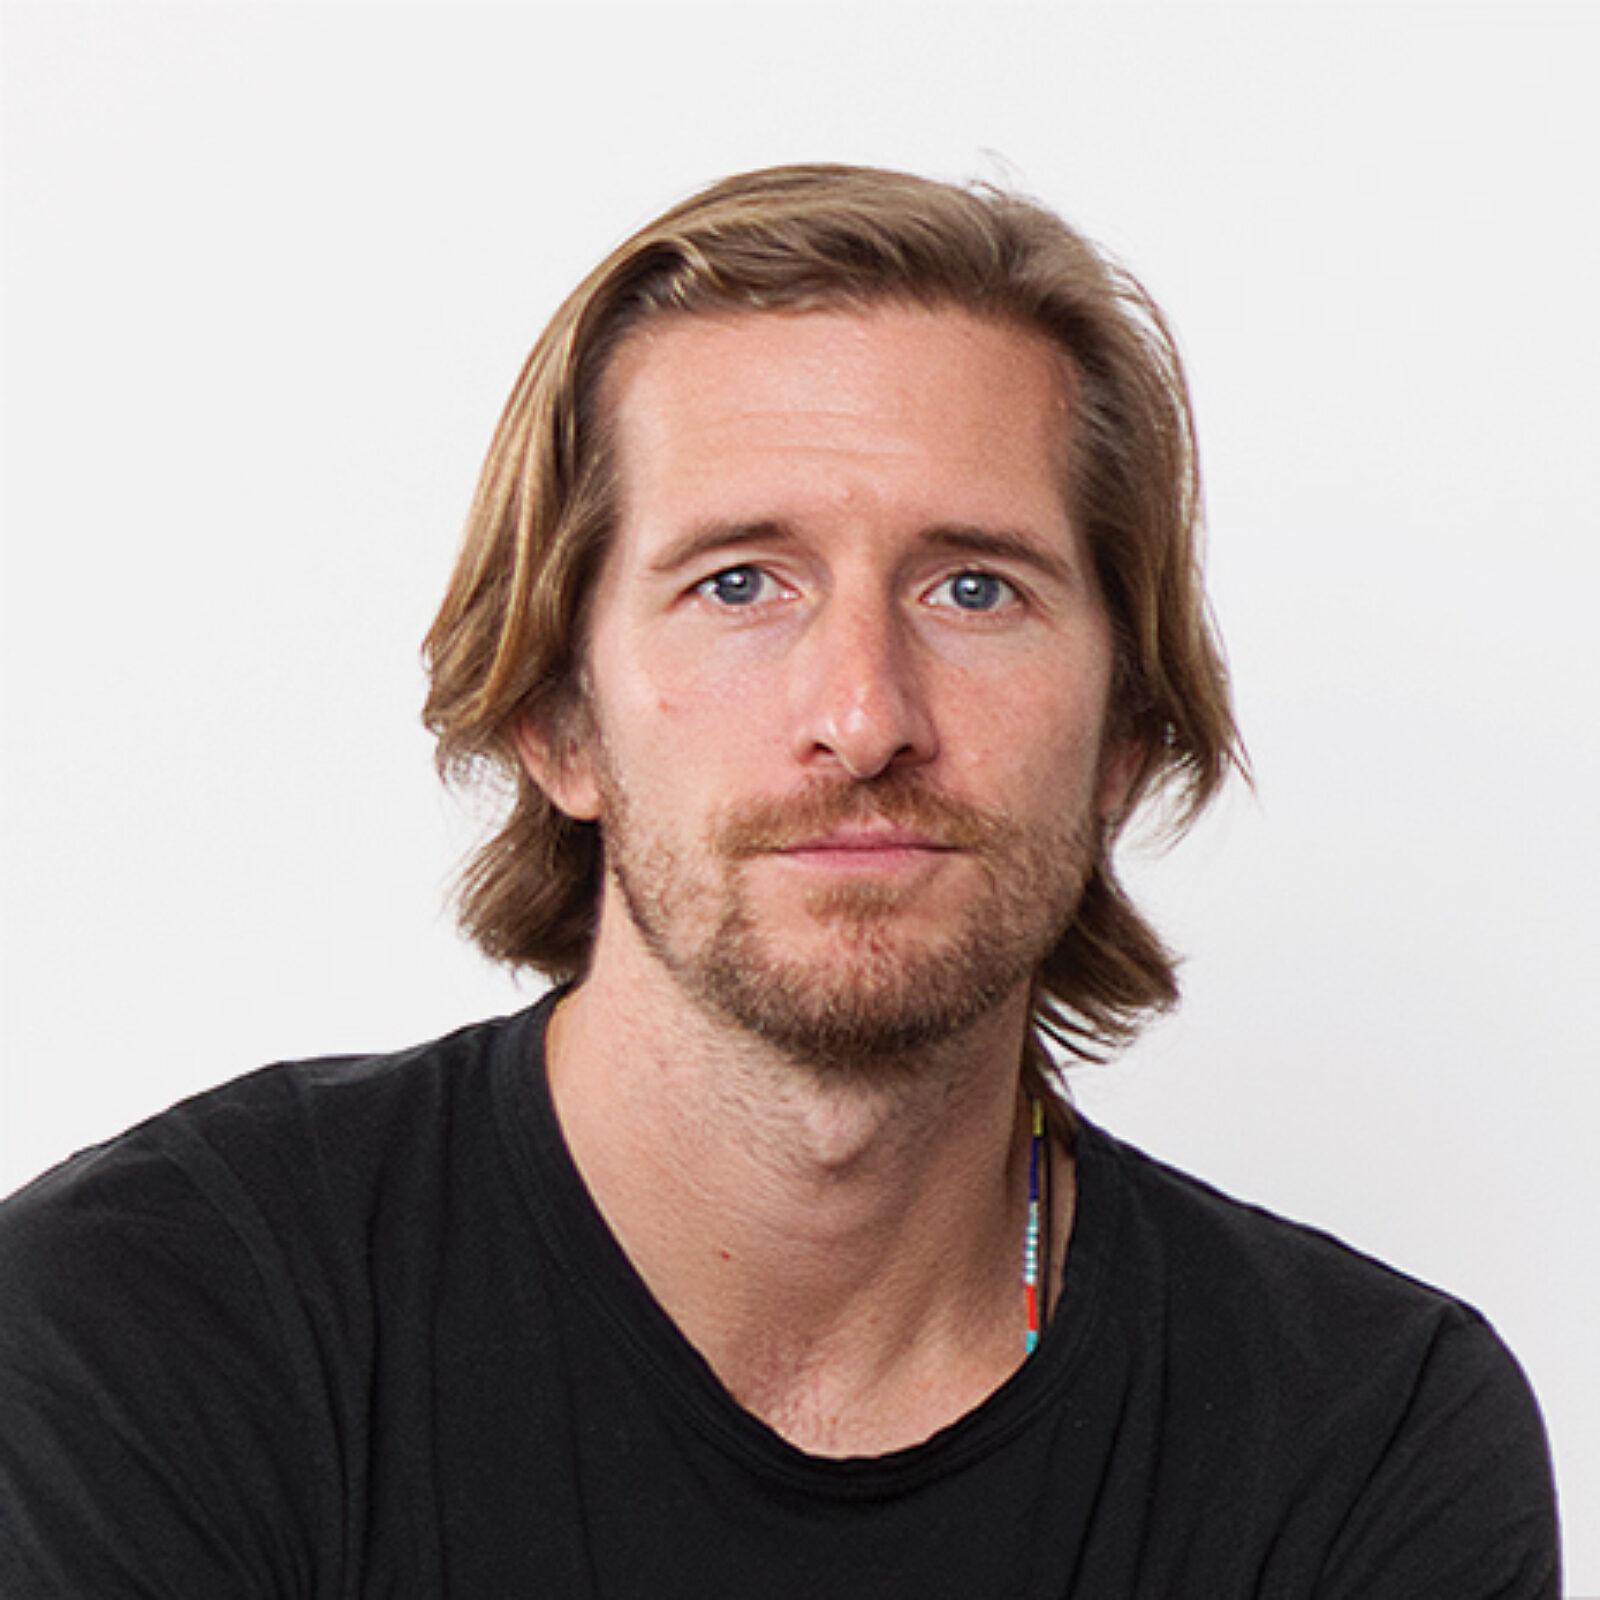 Jakob Schreyer